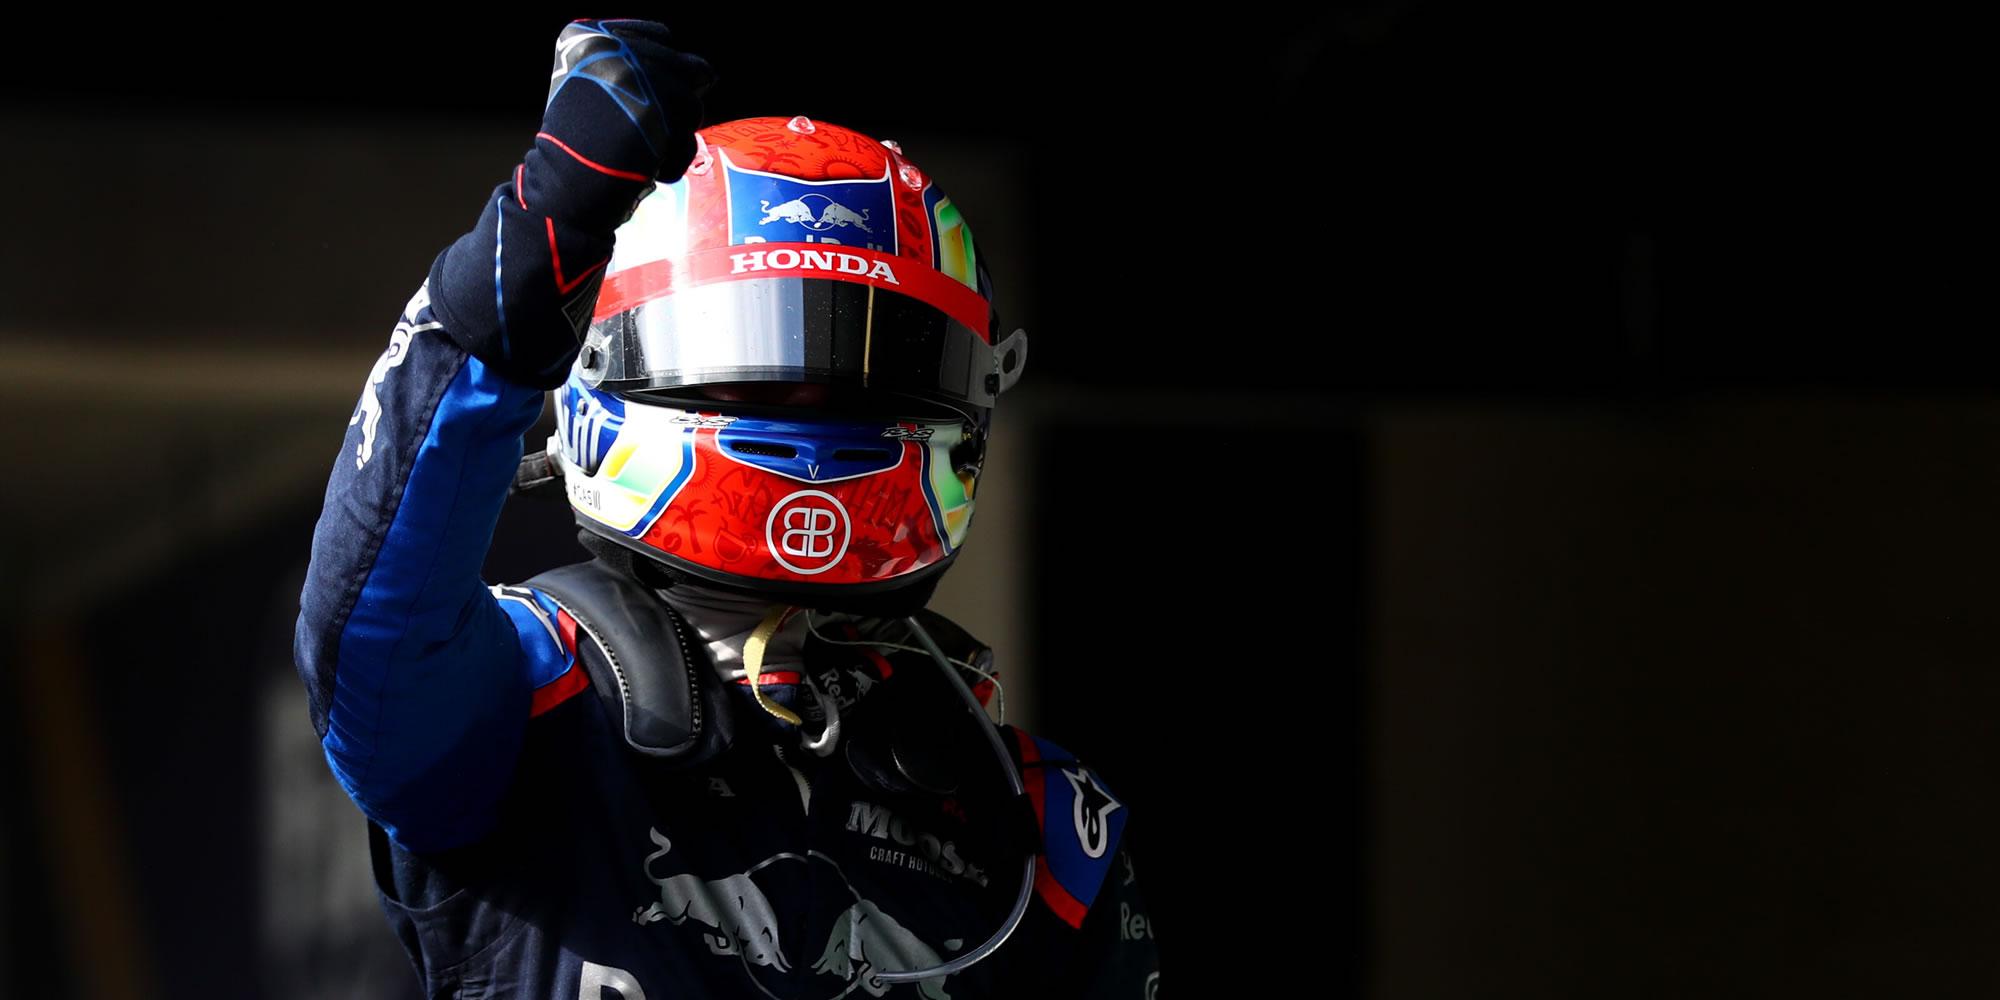 Brazil GP 2019 – Podium! 10